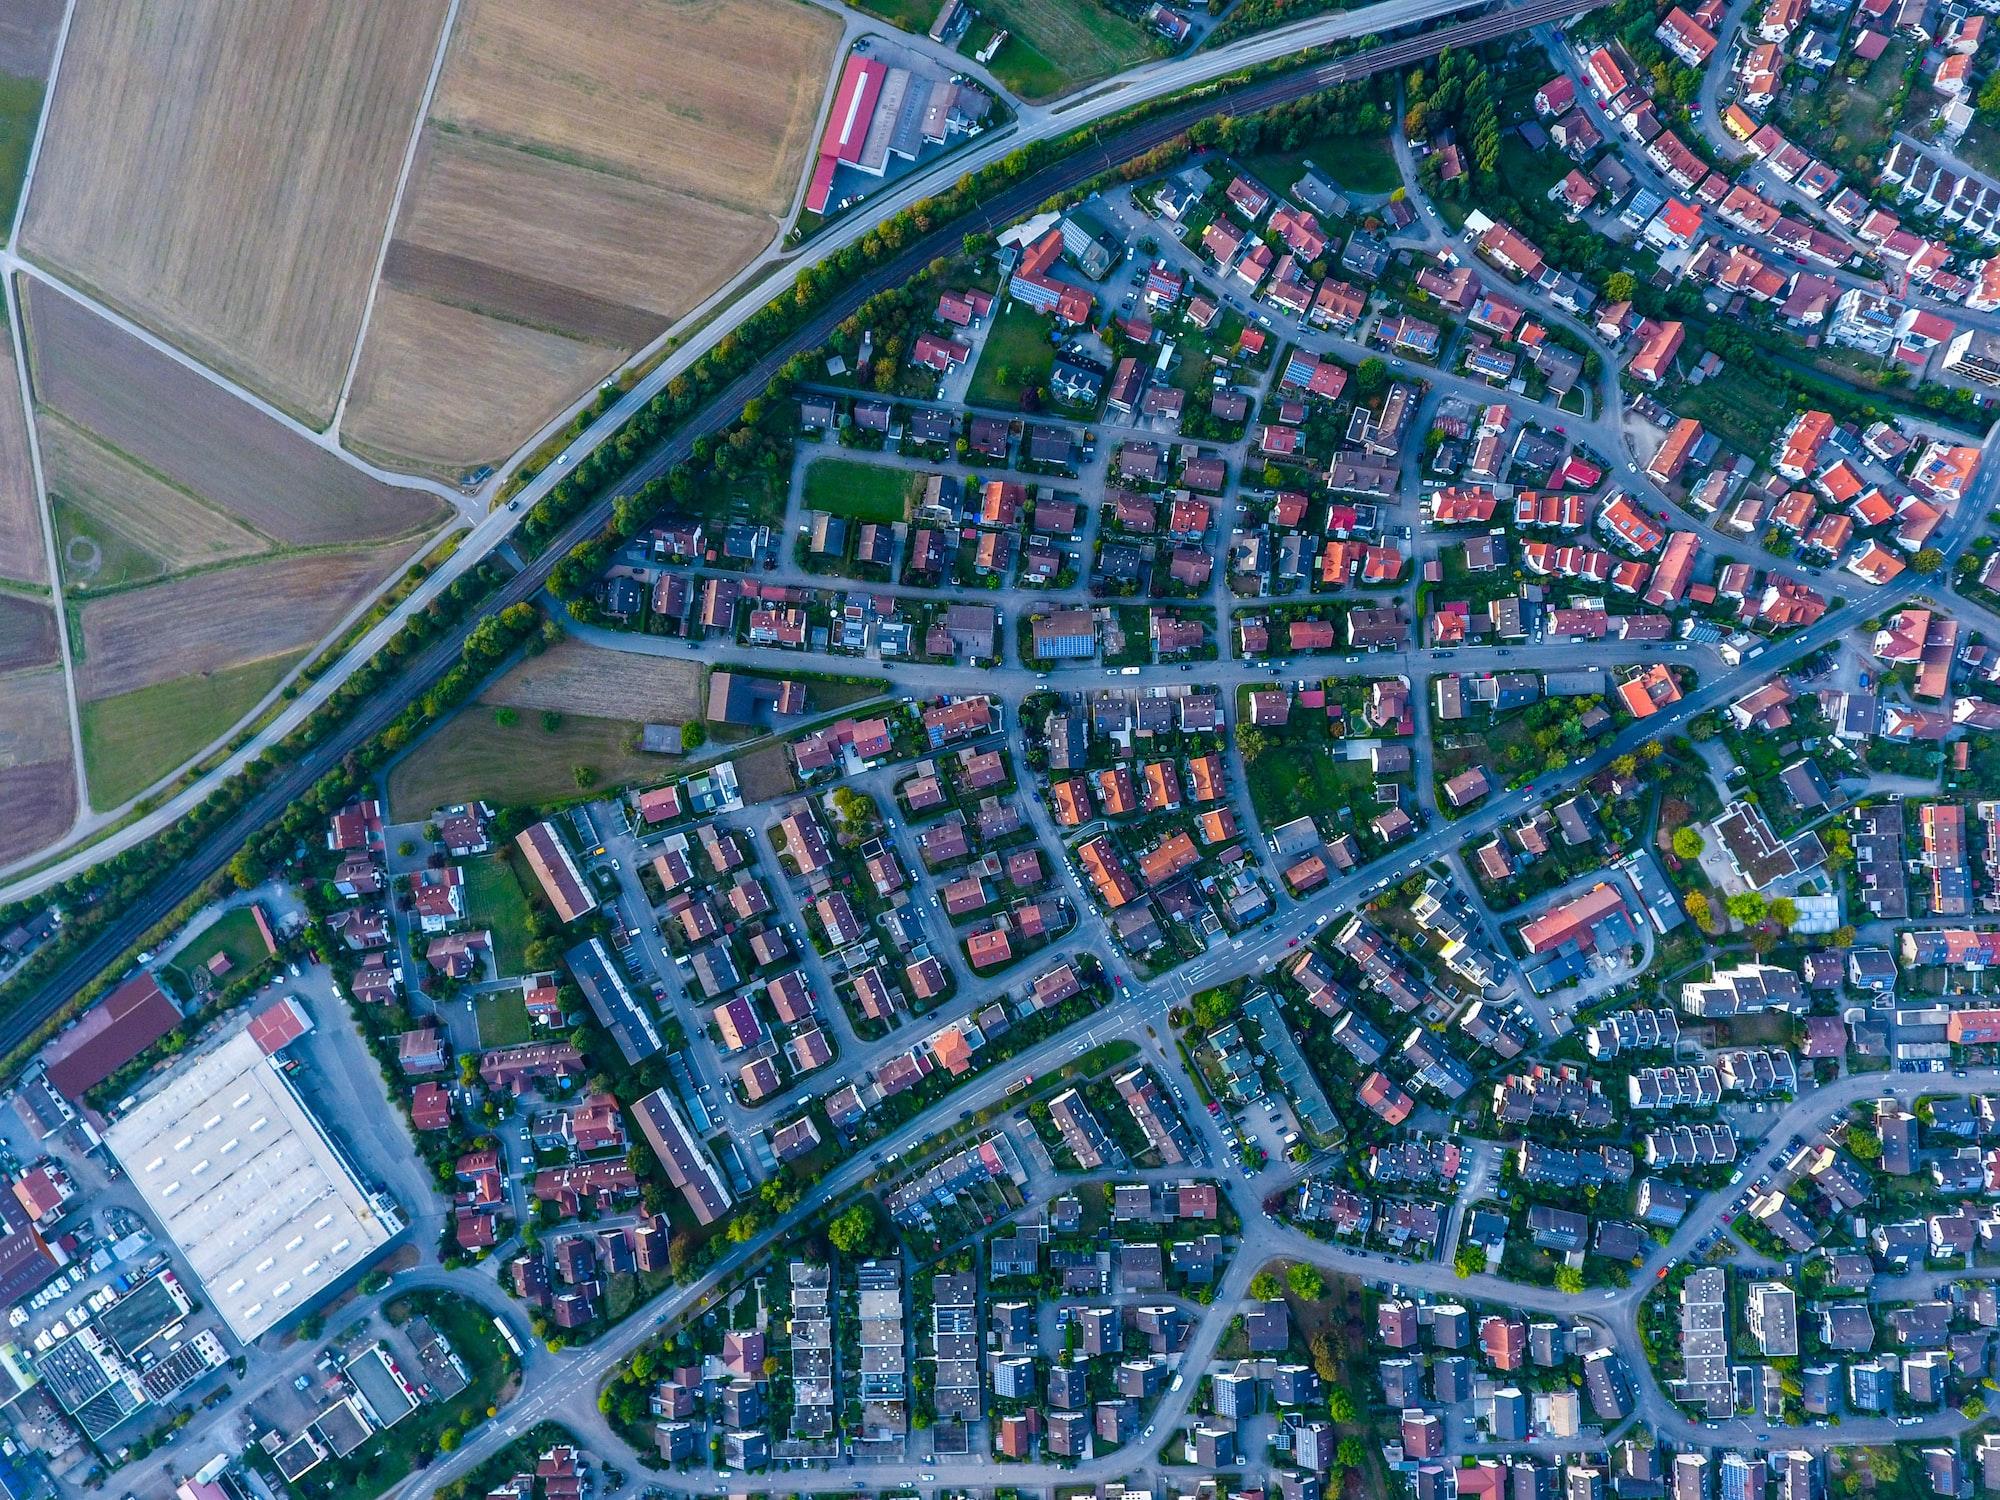 OpenStreetMap vs. Google Maps